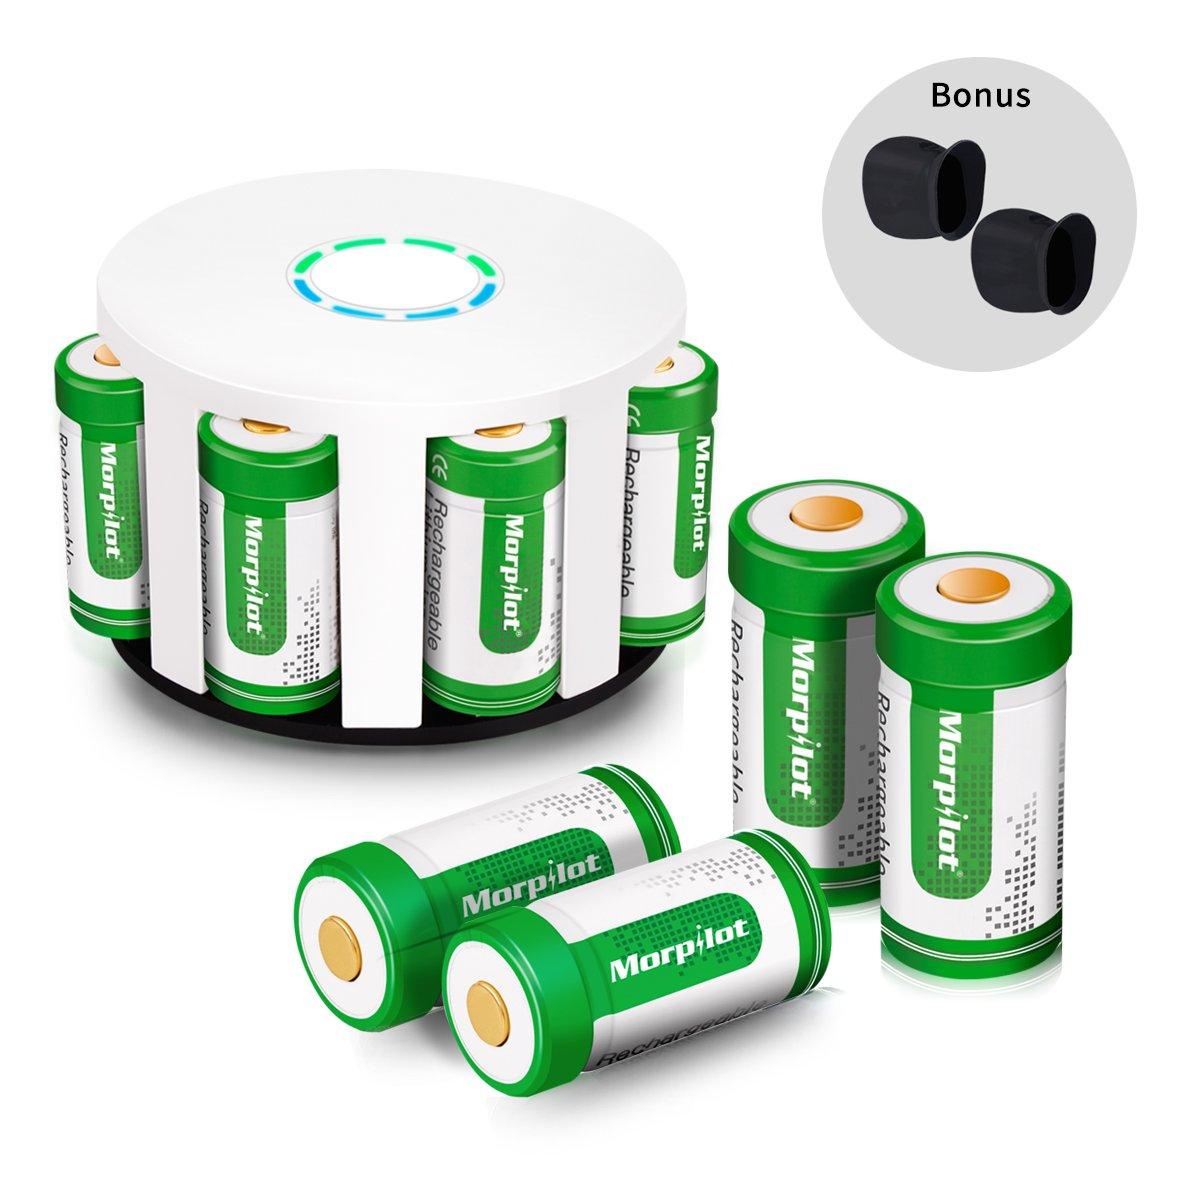 Morpilot RCR123A Rechargeable Batteries Charger 8Pcs 3.7V 700mAh Li-ion Battery 8 Slot Charger Arlo VMC3030/3230/3330/3430/3530 Security Cameras